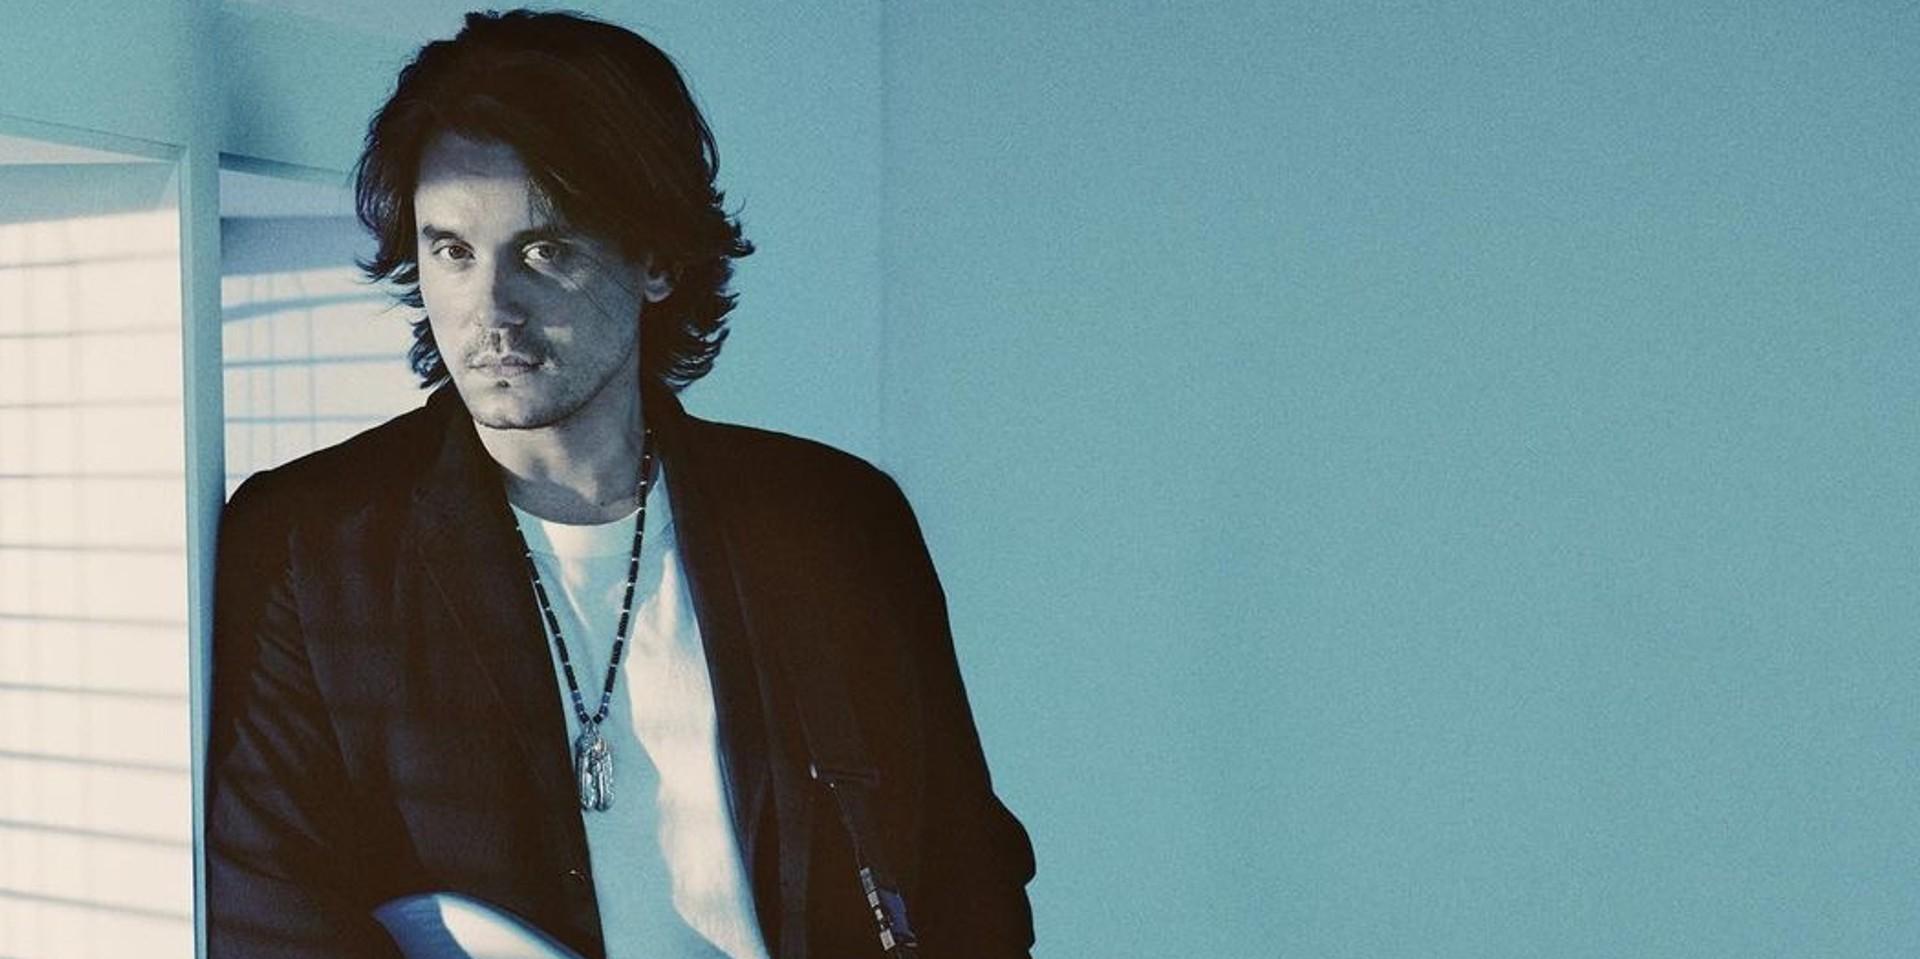 John Mayer previews forthcoming album 'Sob Rock' with new single 'Last Train Home' — listen